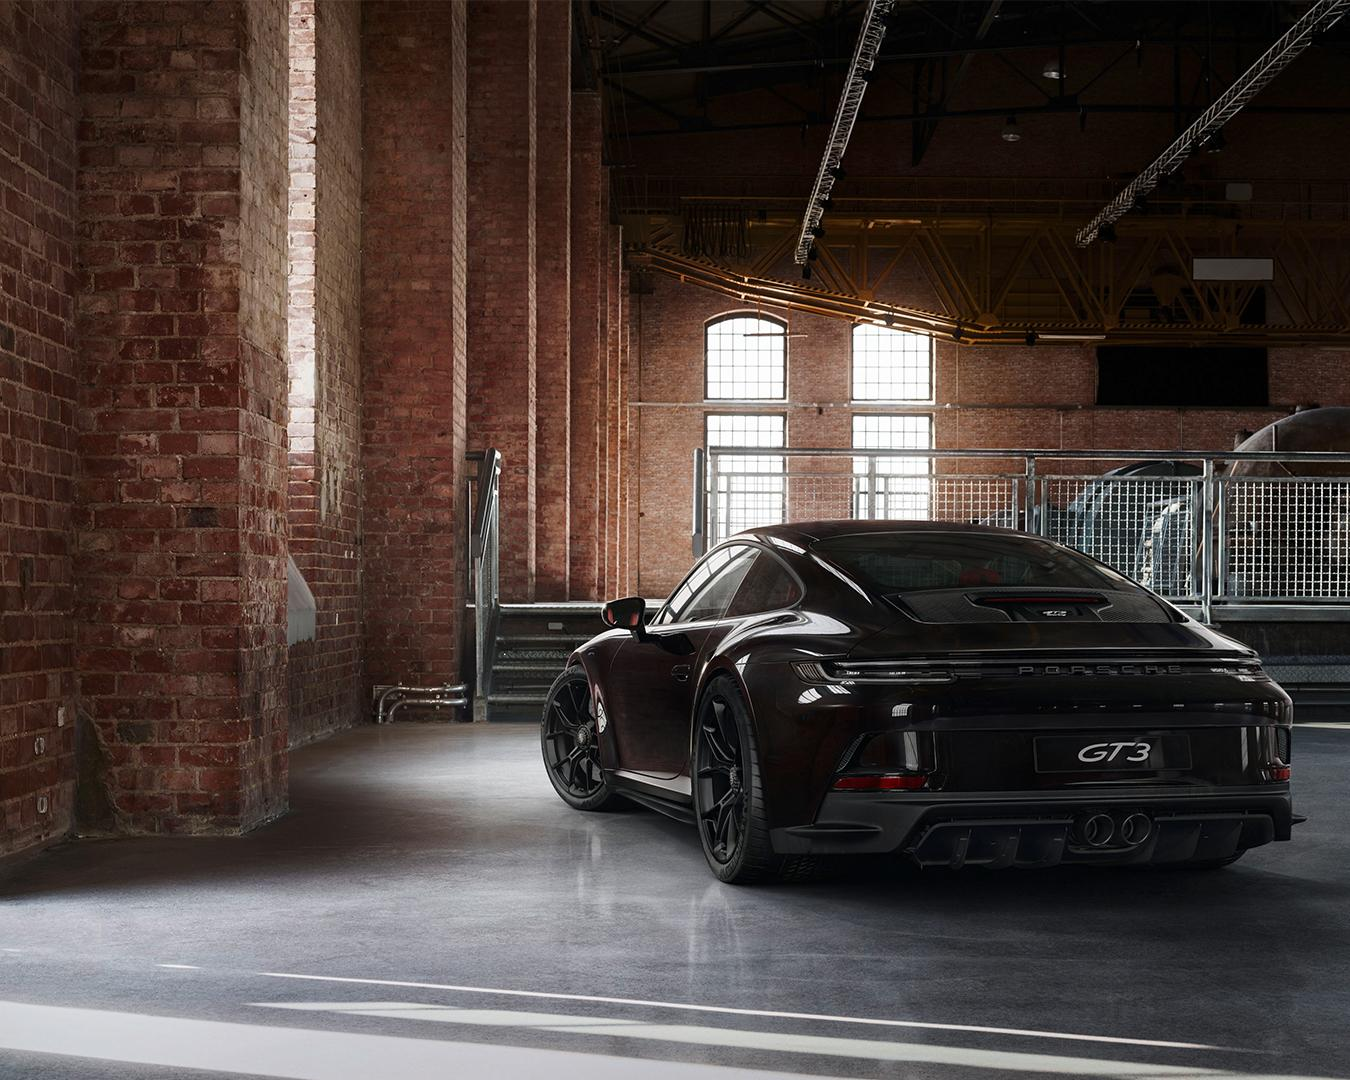 Porsche-911-GT3-Touring-by-Porsche-Exclusive-Manufaktur-1